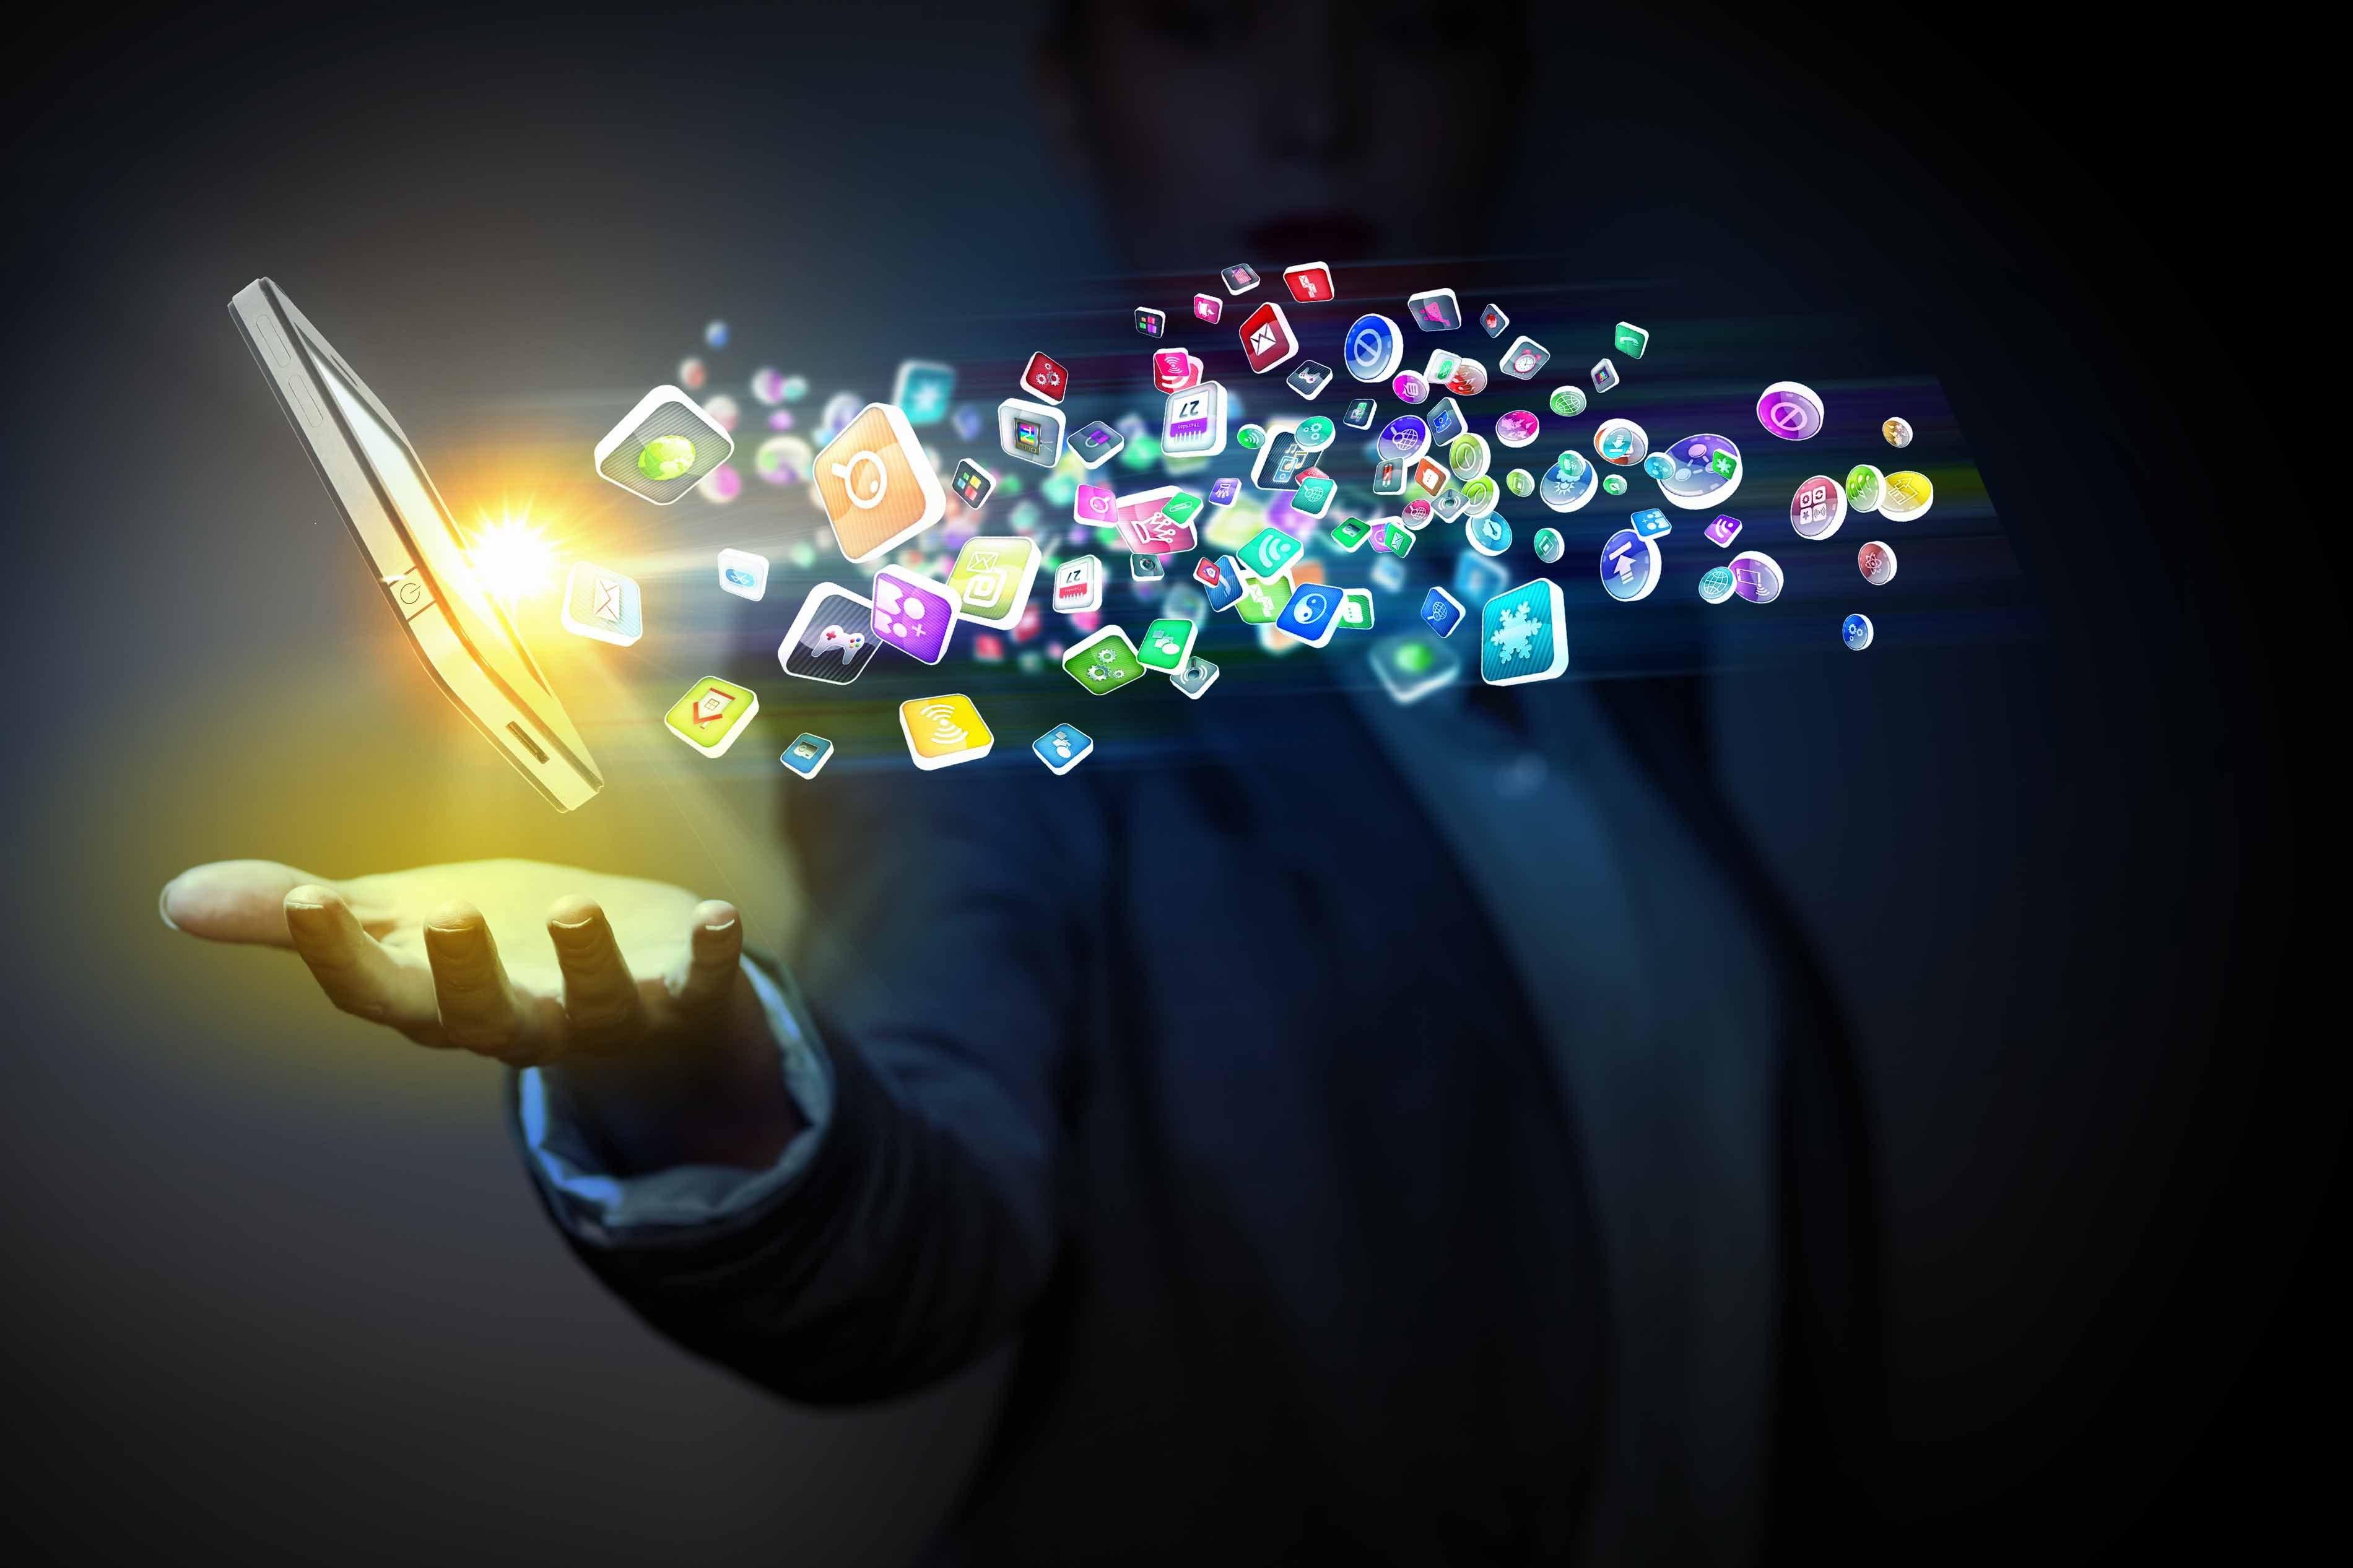 Top 10 Apps for Entrepreneurs & Go-Getters